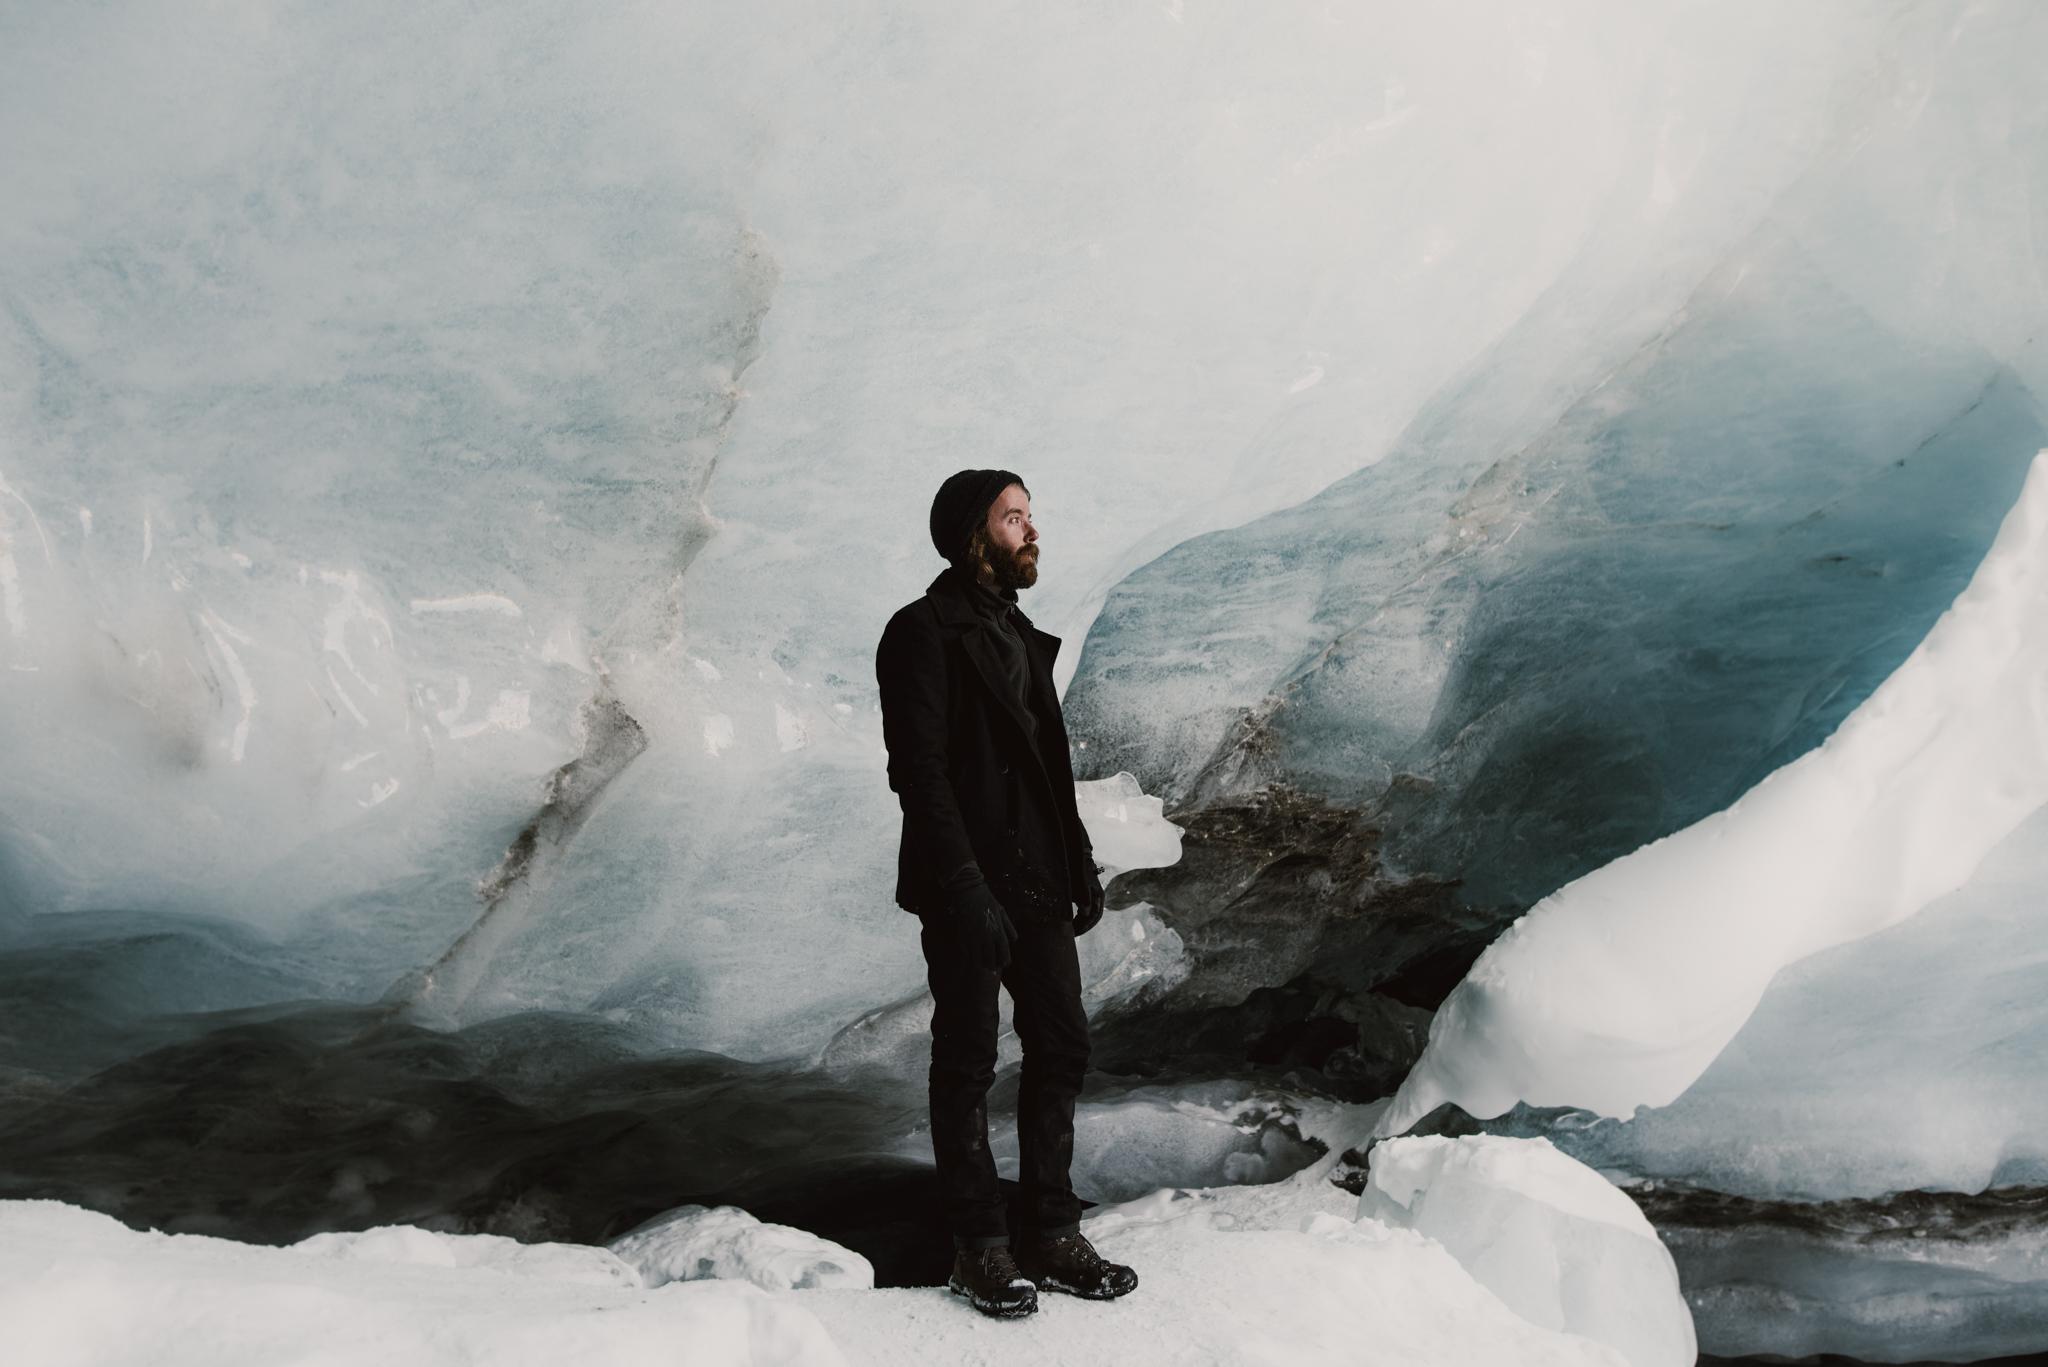 ©The-Ryans-Photo---Athabasca-Glacier,-Ice-Cave-043.jpg